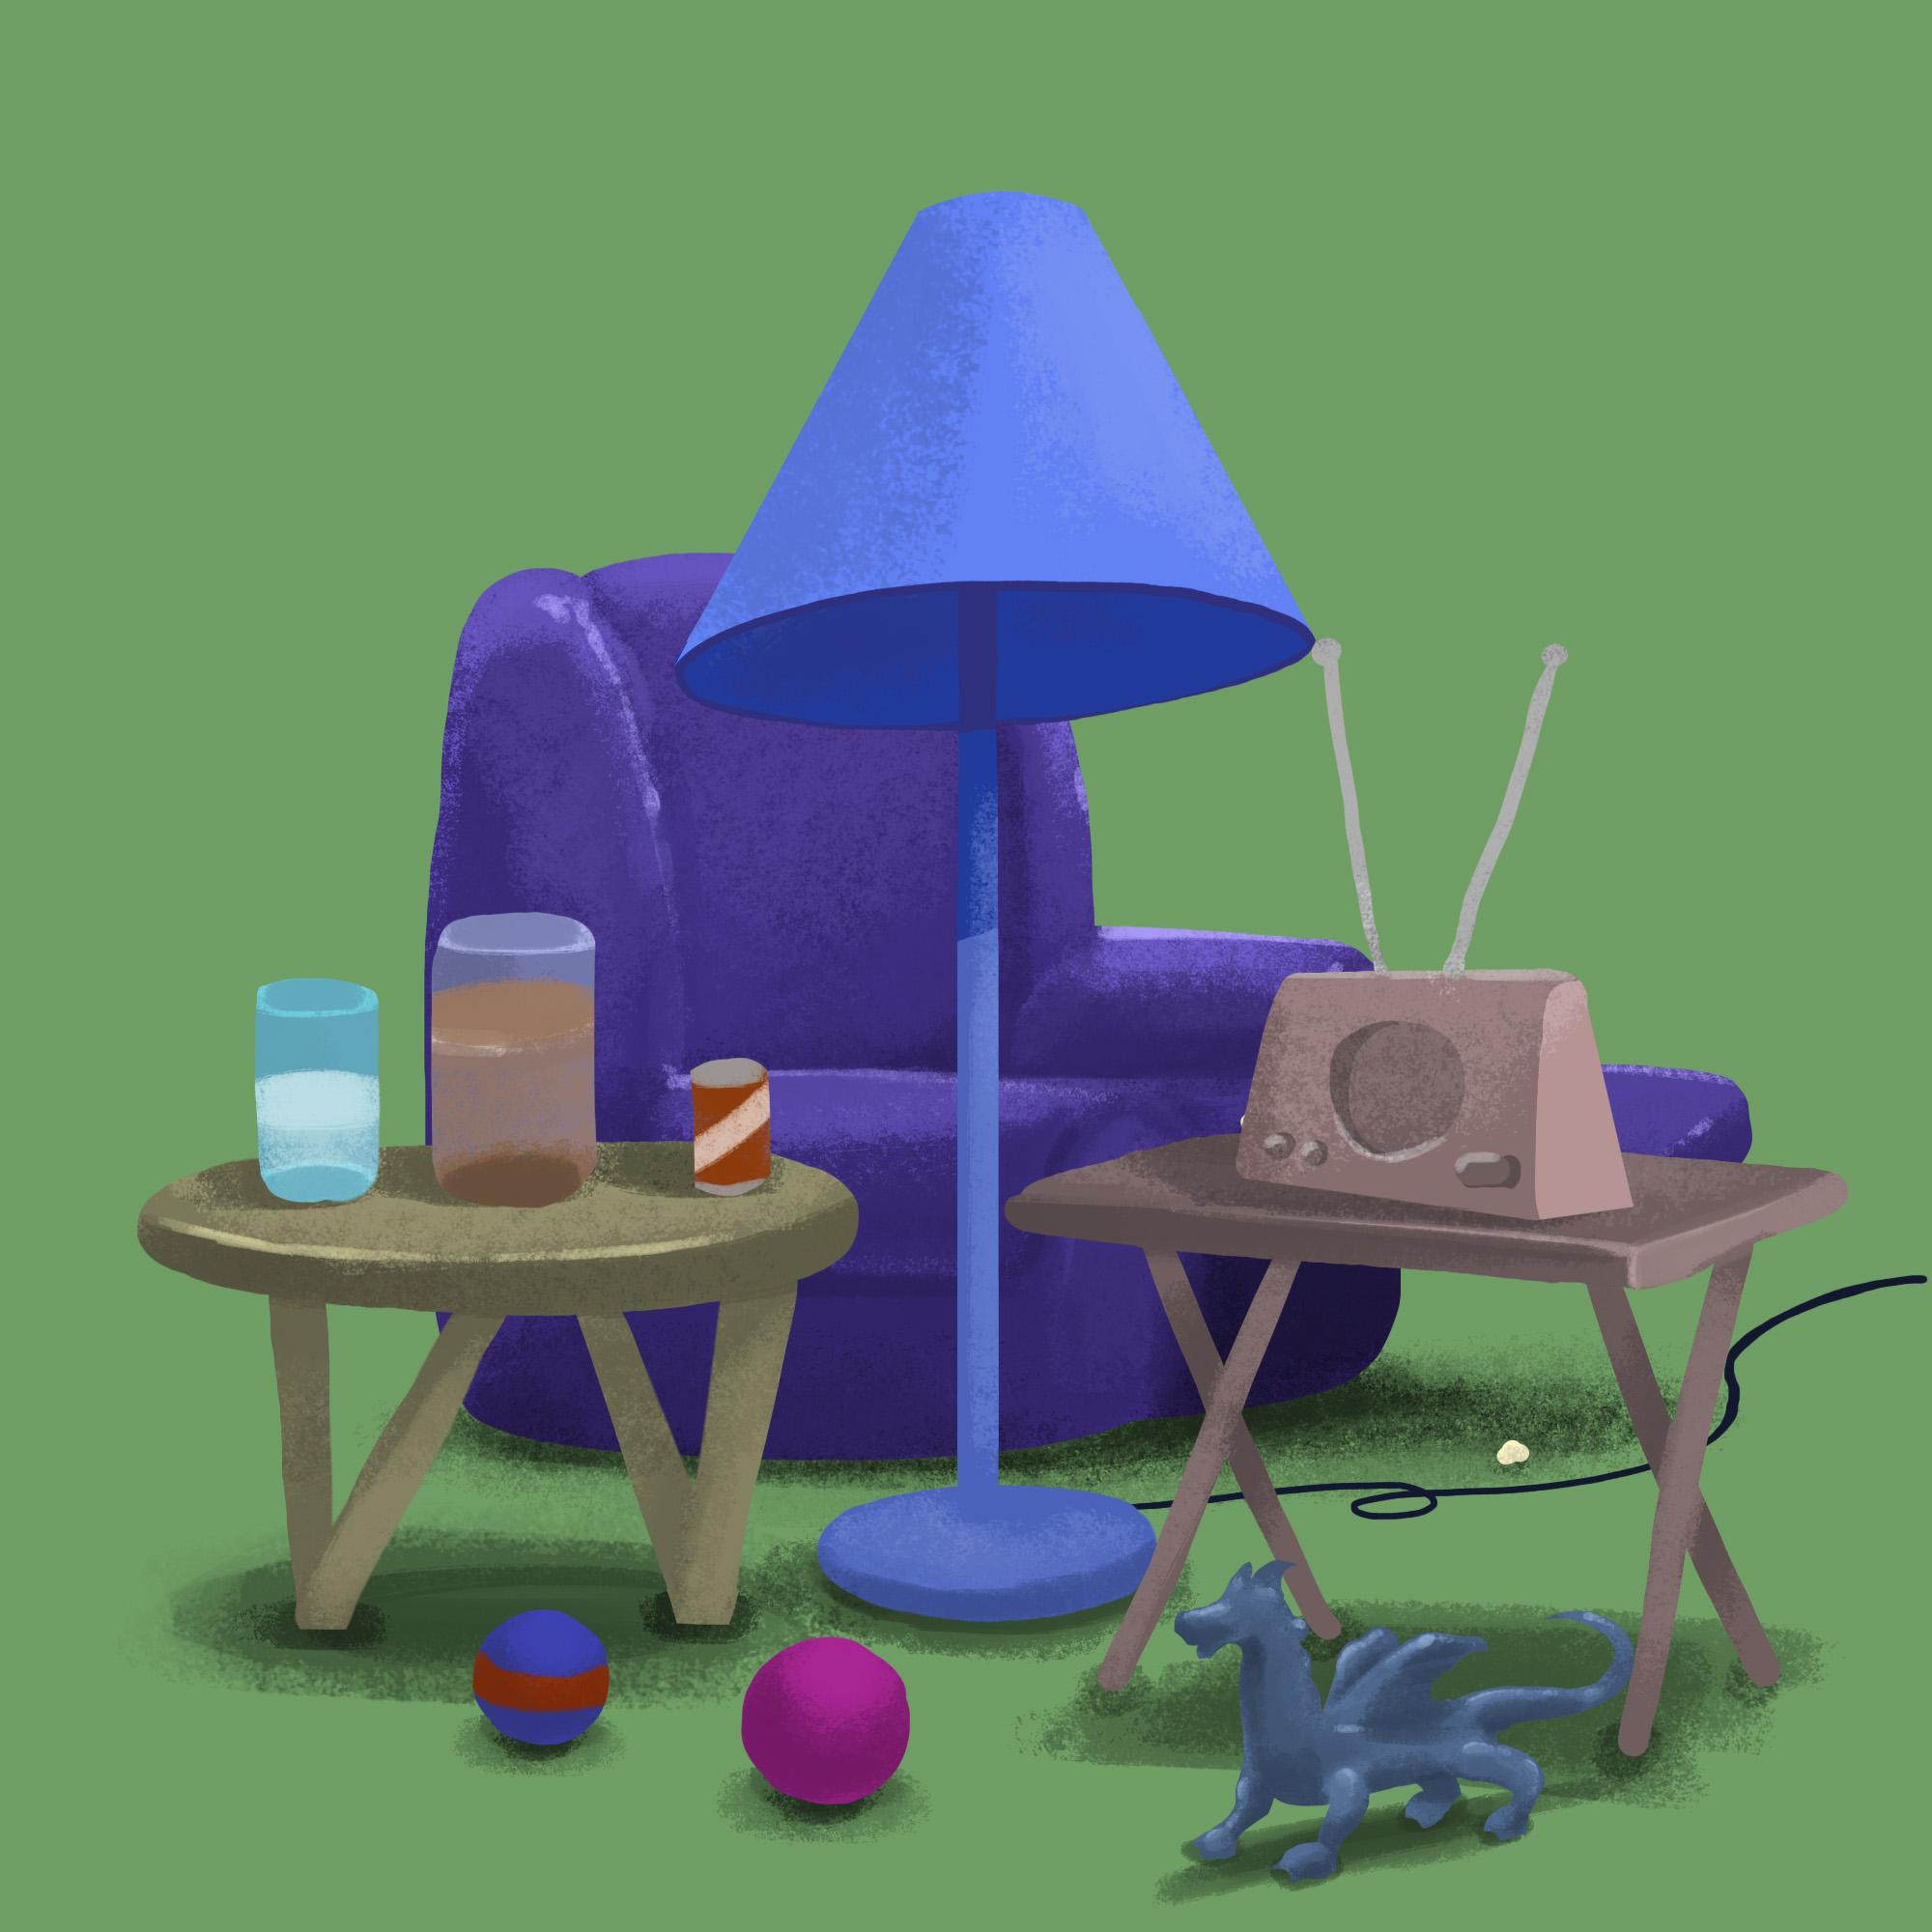 Intel_Mobile_room_objects_01.jpg